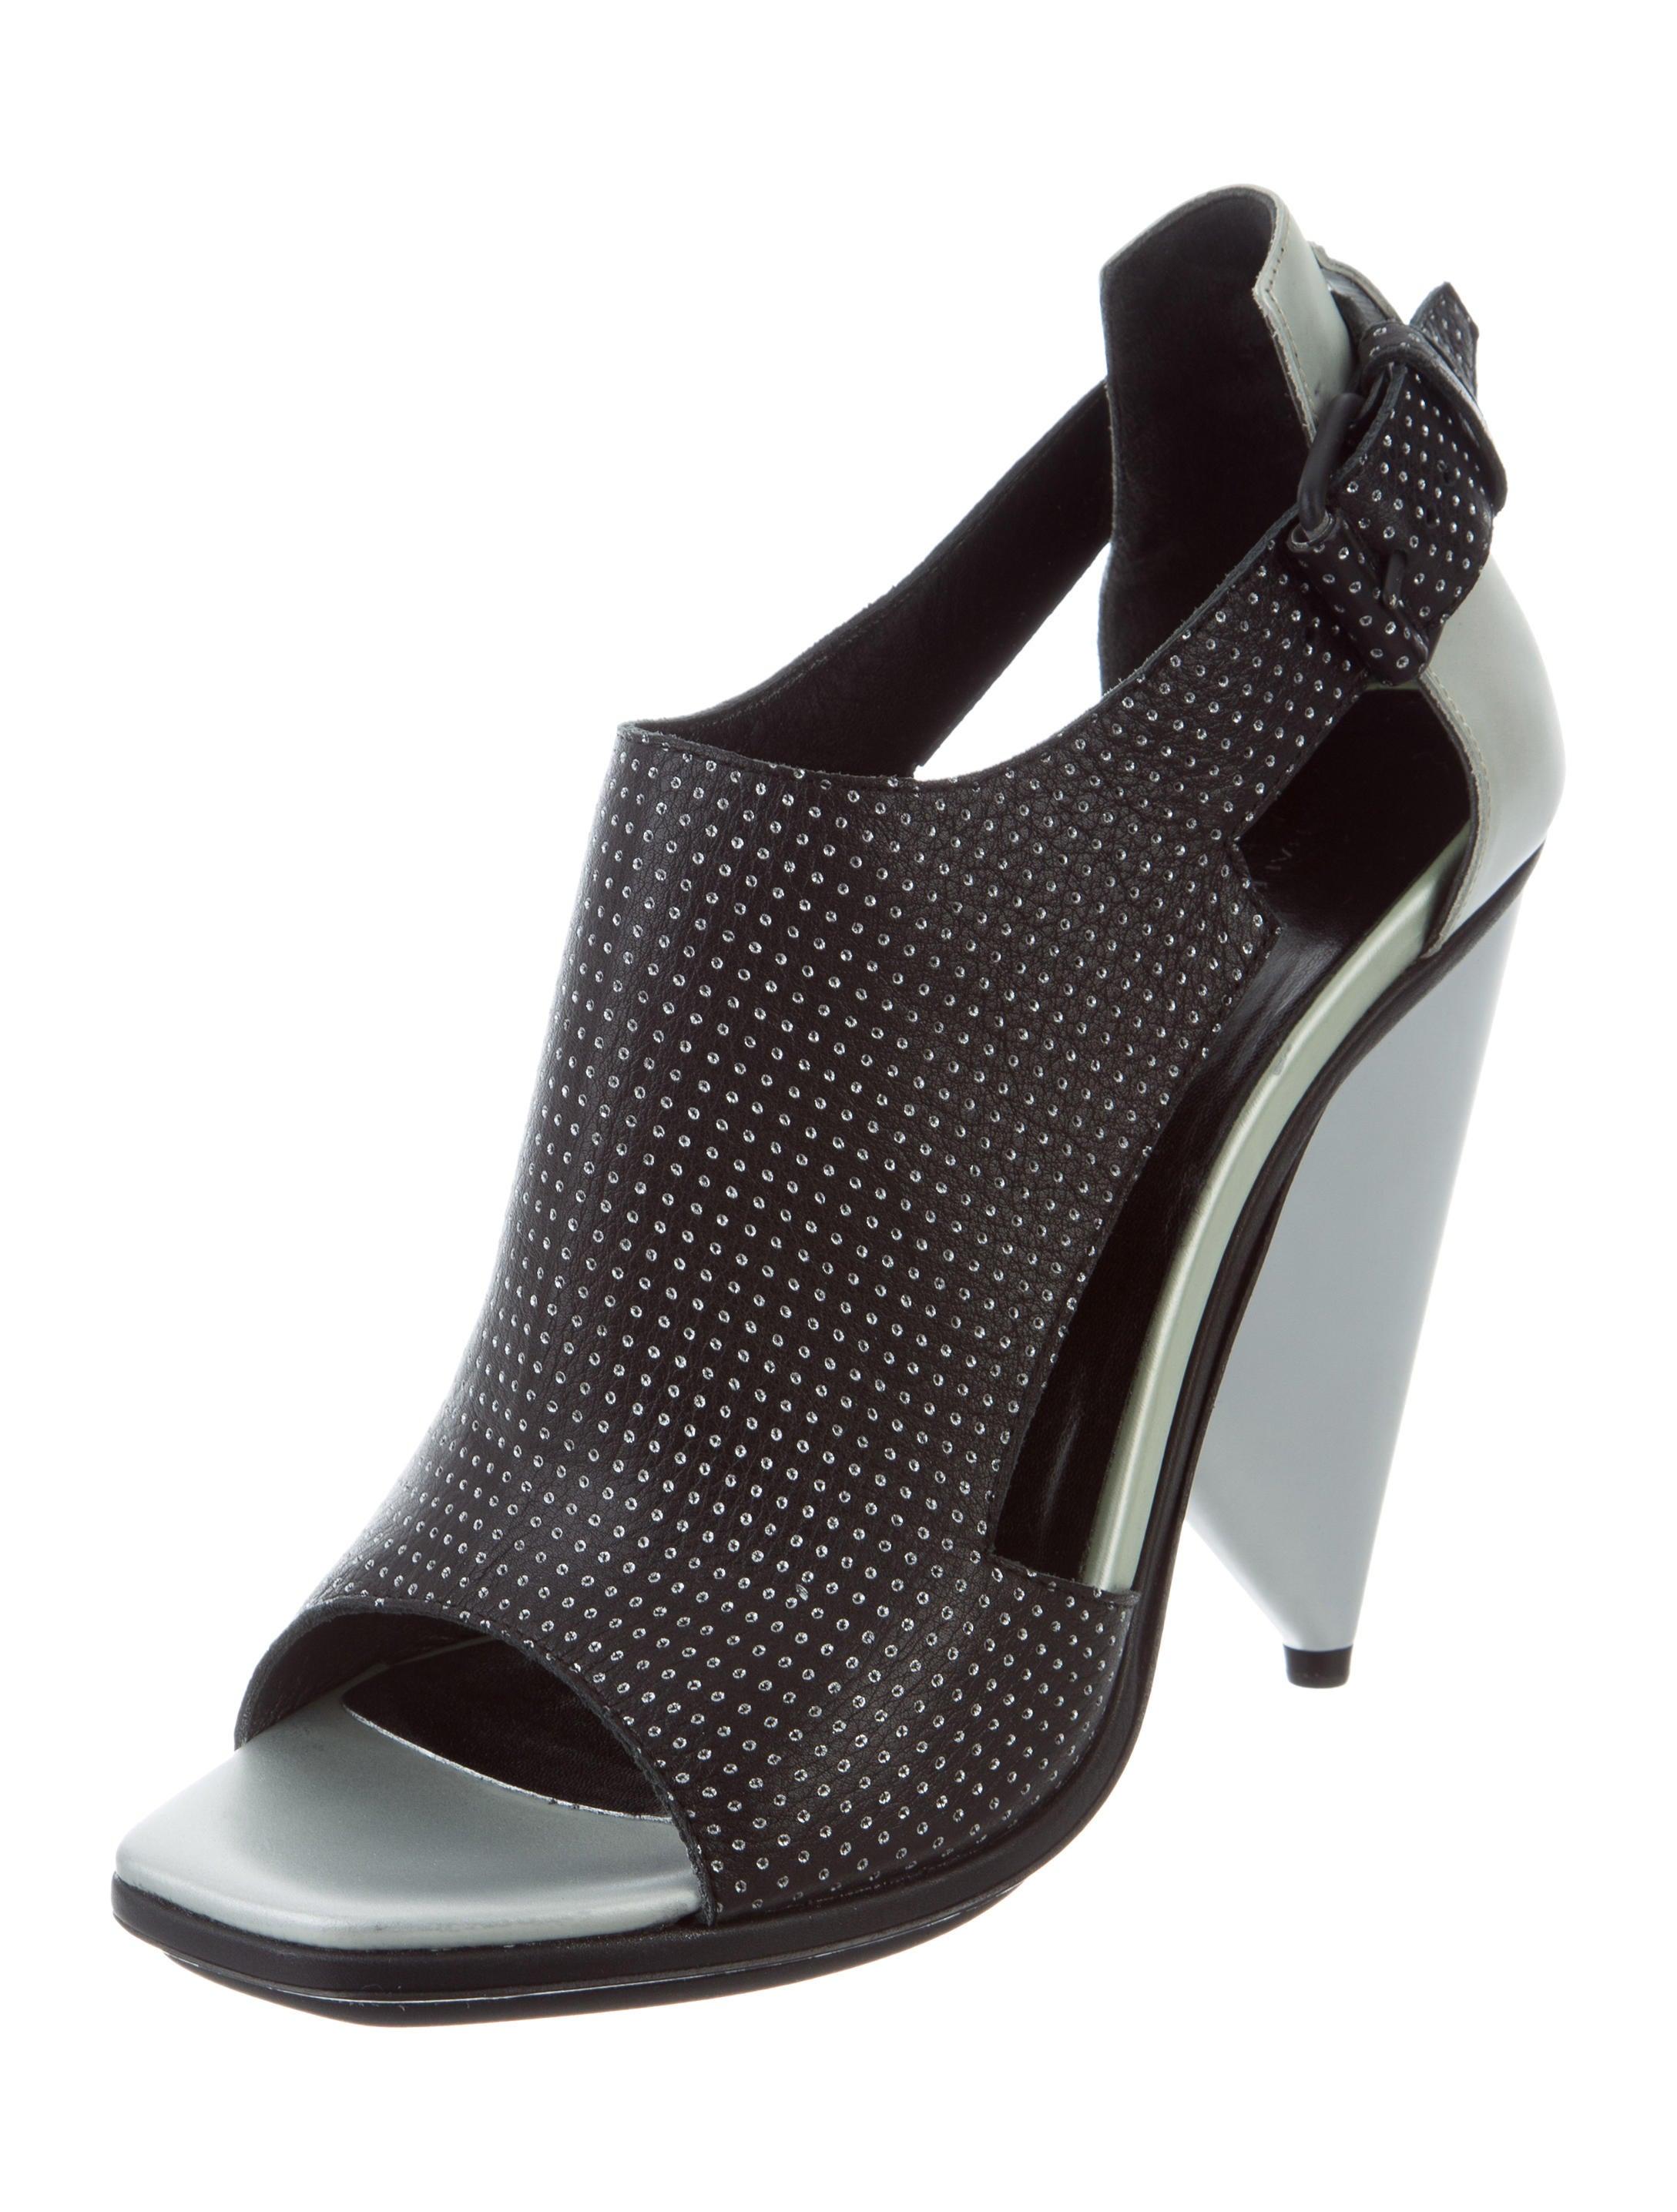 clearance with credit card sale eastbay Balenciaga Polka Dot Geometric Sandals w/ Tags sale fashionable k1sOPnj